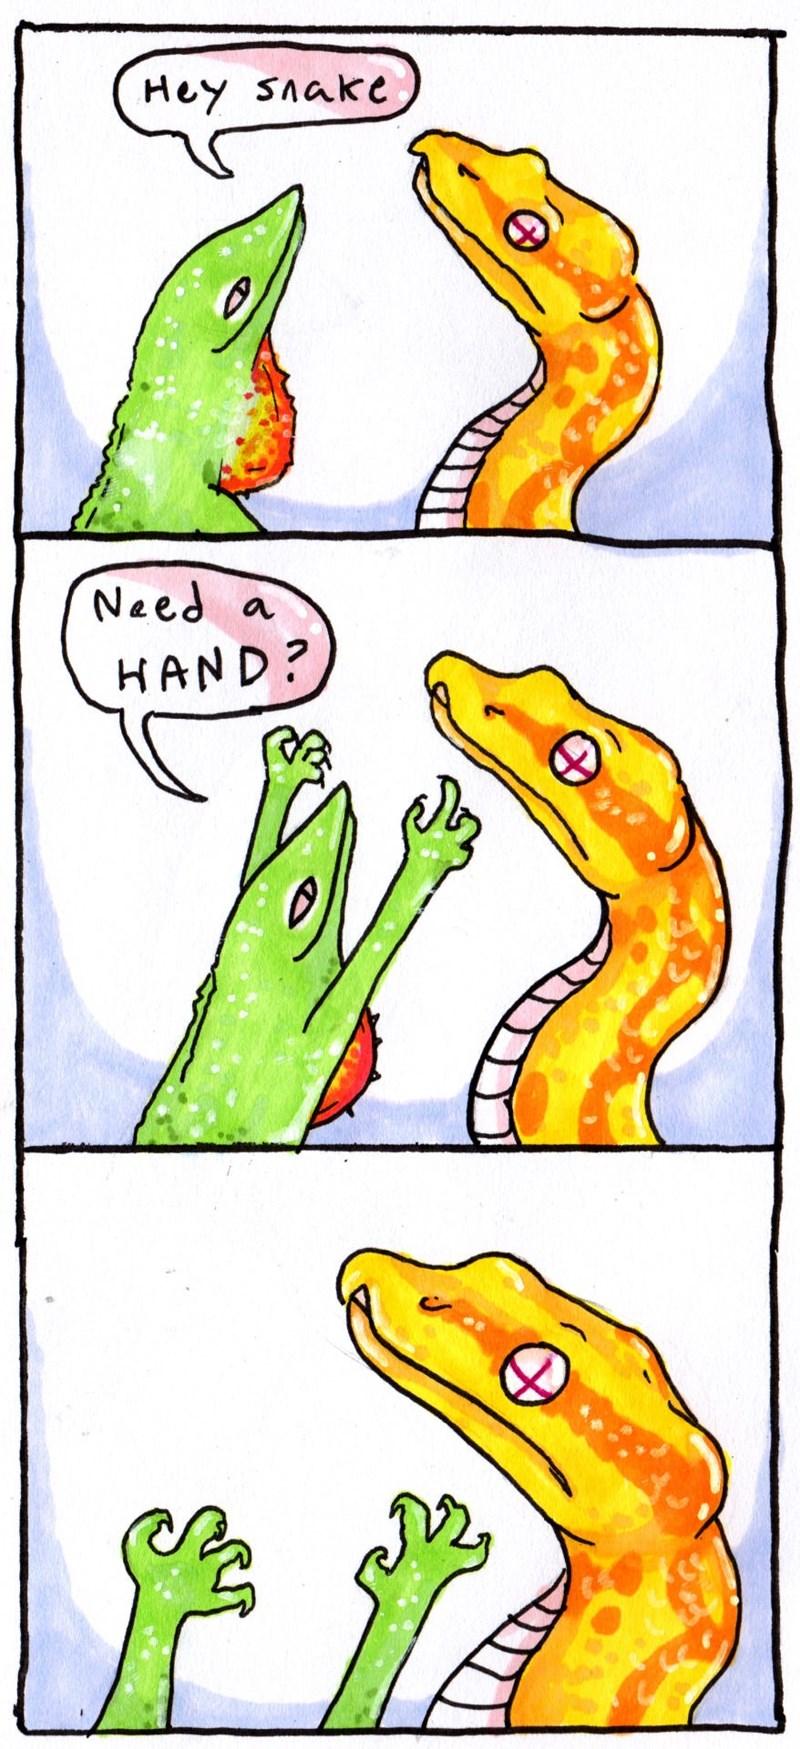 Clip art - Hey SAake Need a HAND?